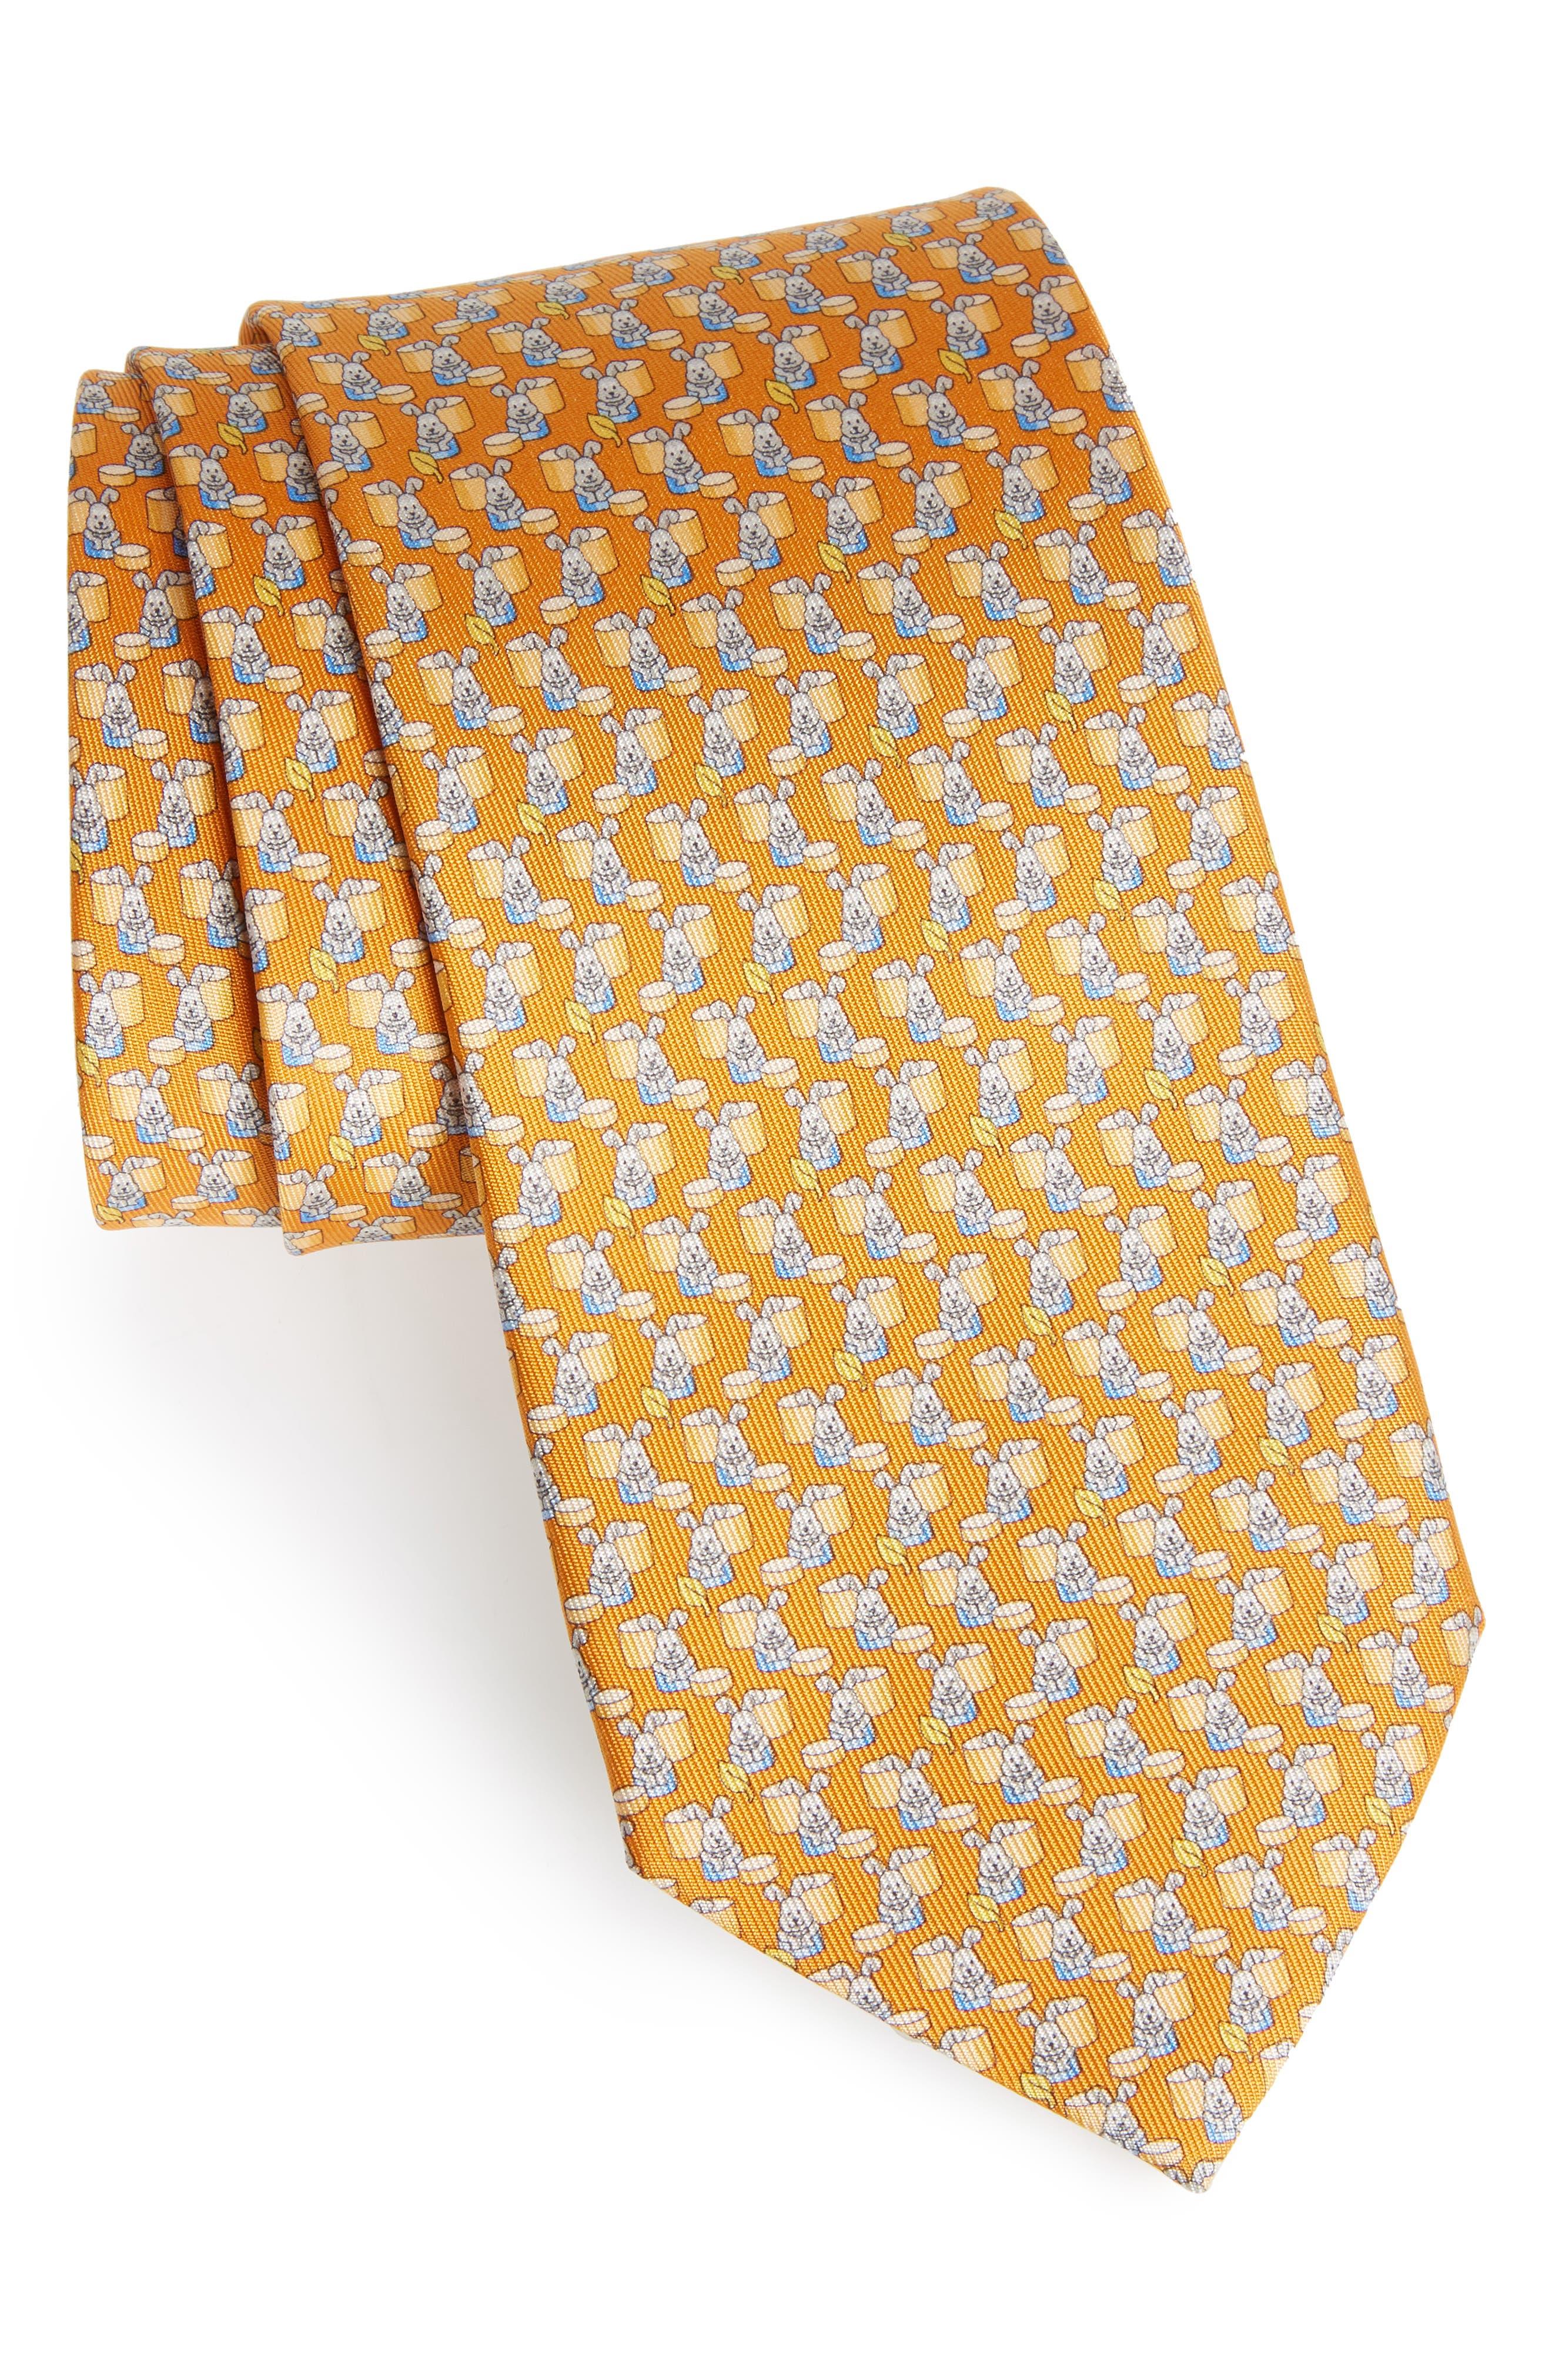 Salvatore Ferragamo Bunny Print Silk Tie